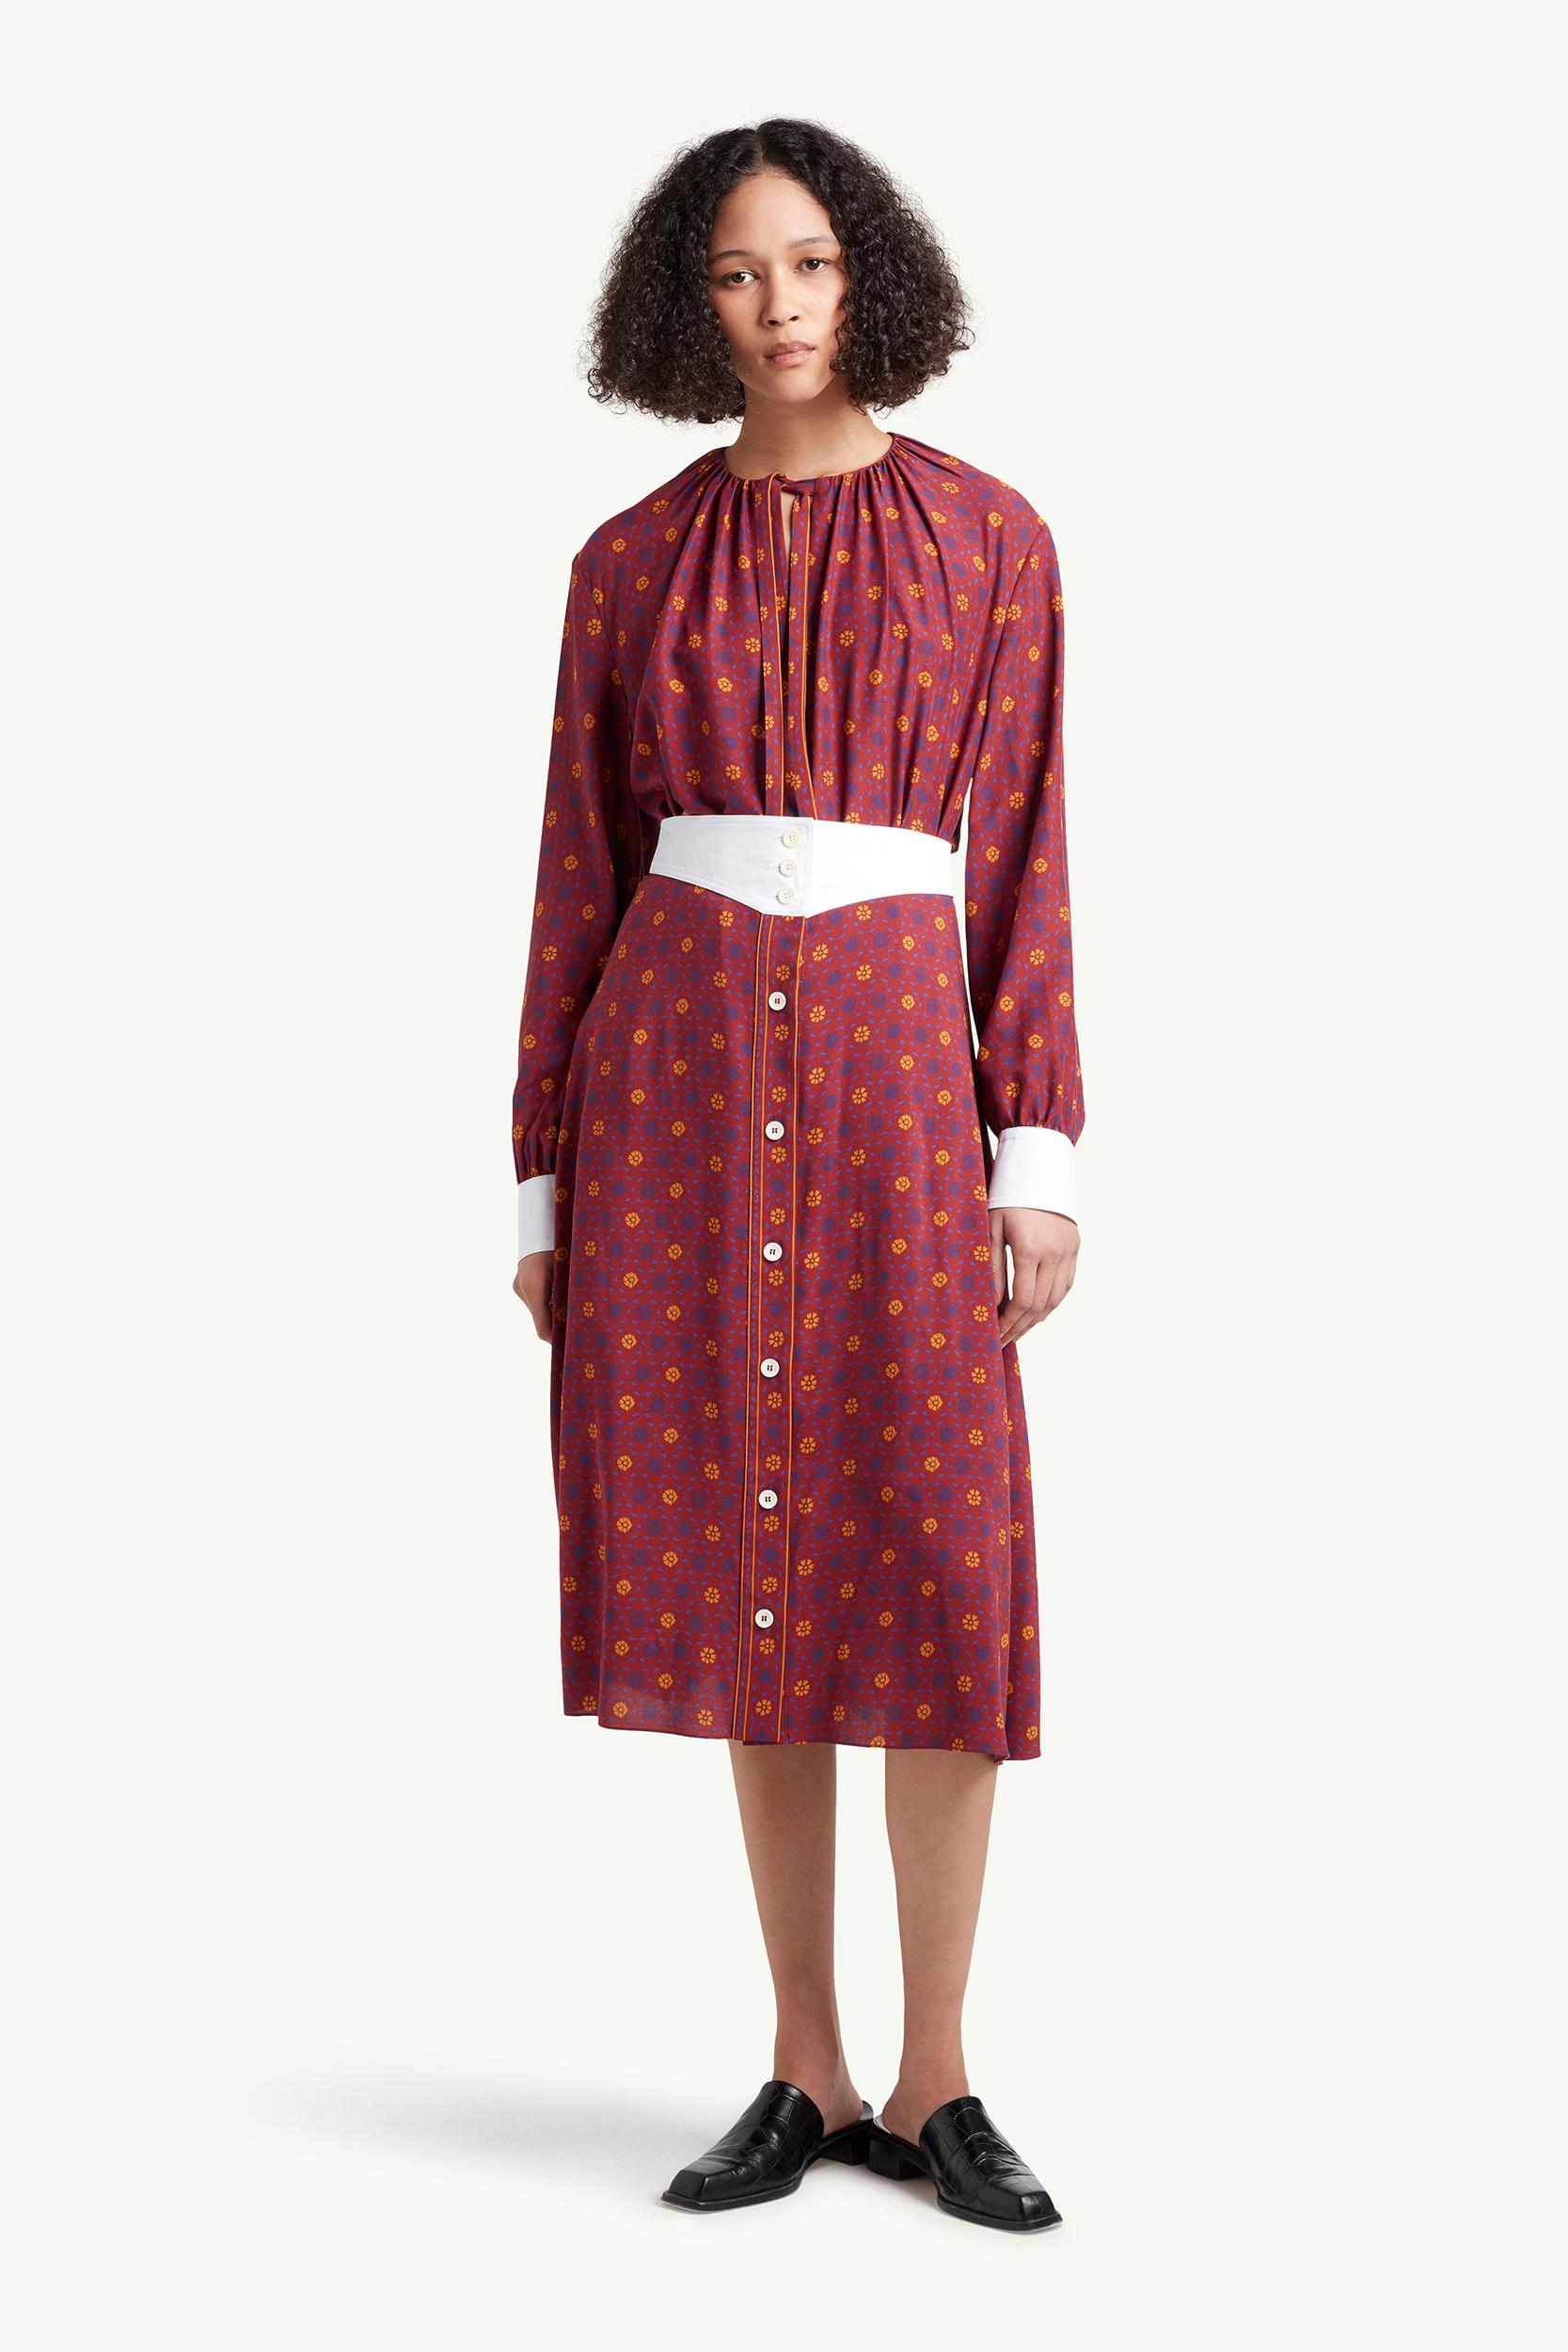 Womenswear model wearing  Wales Bonner dress in burgundy with pattern and white belt | LRP